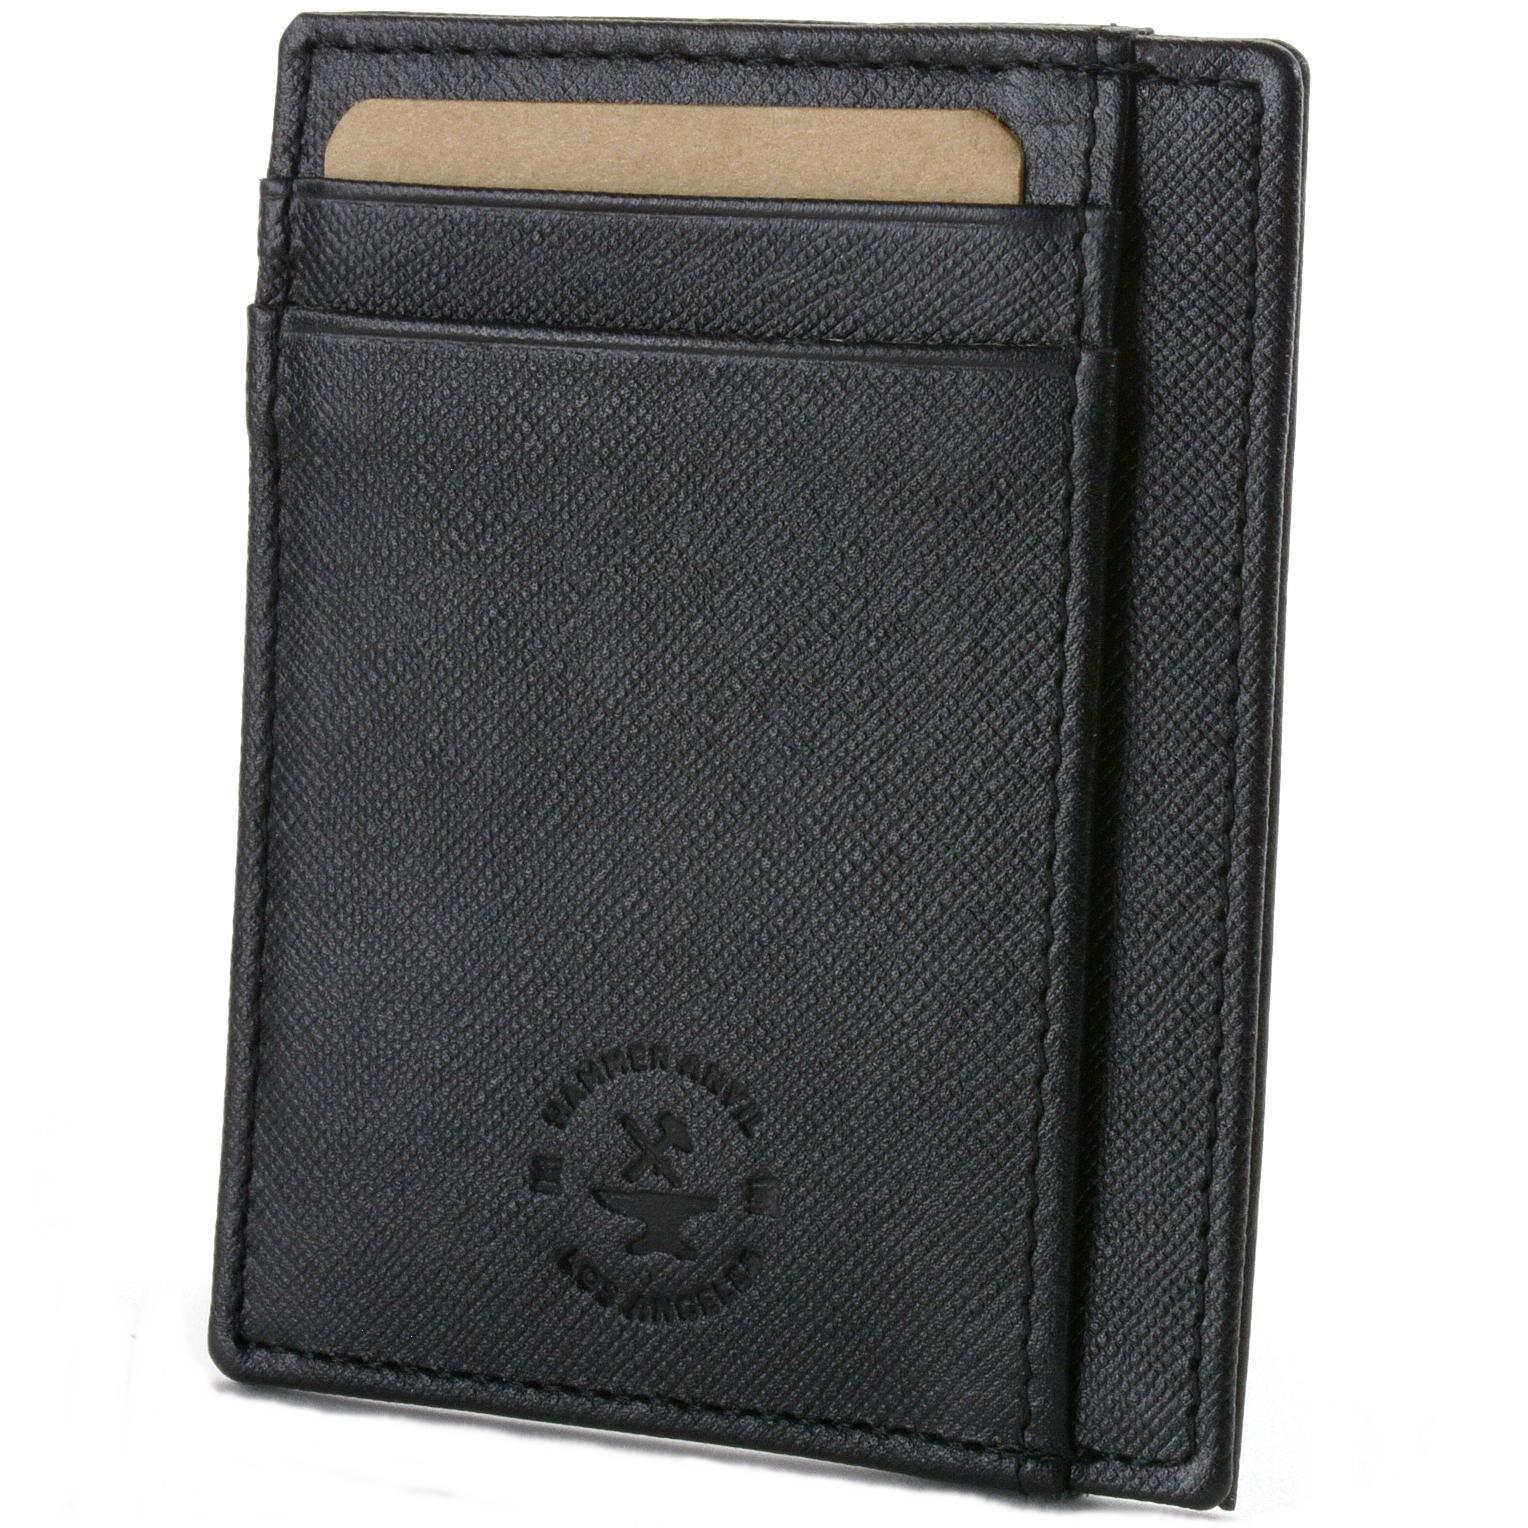 miniature 33 - Hammer-Anvil-Minimalist-Front-Pocket-Wallet-RFID-Blocking-Thin-Leather-Card-Case